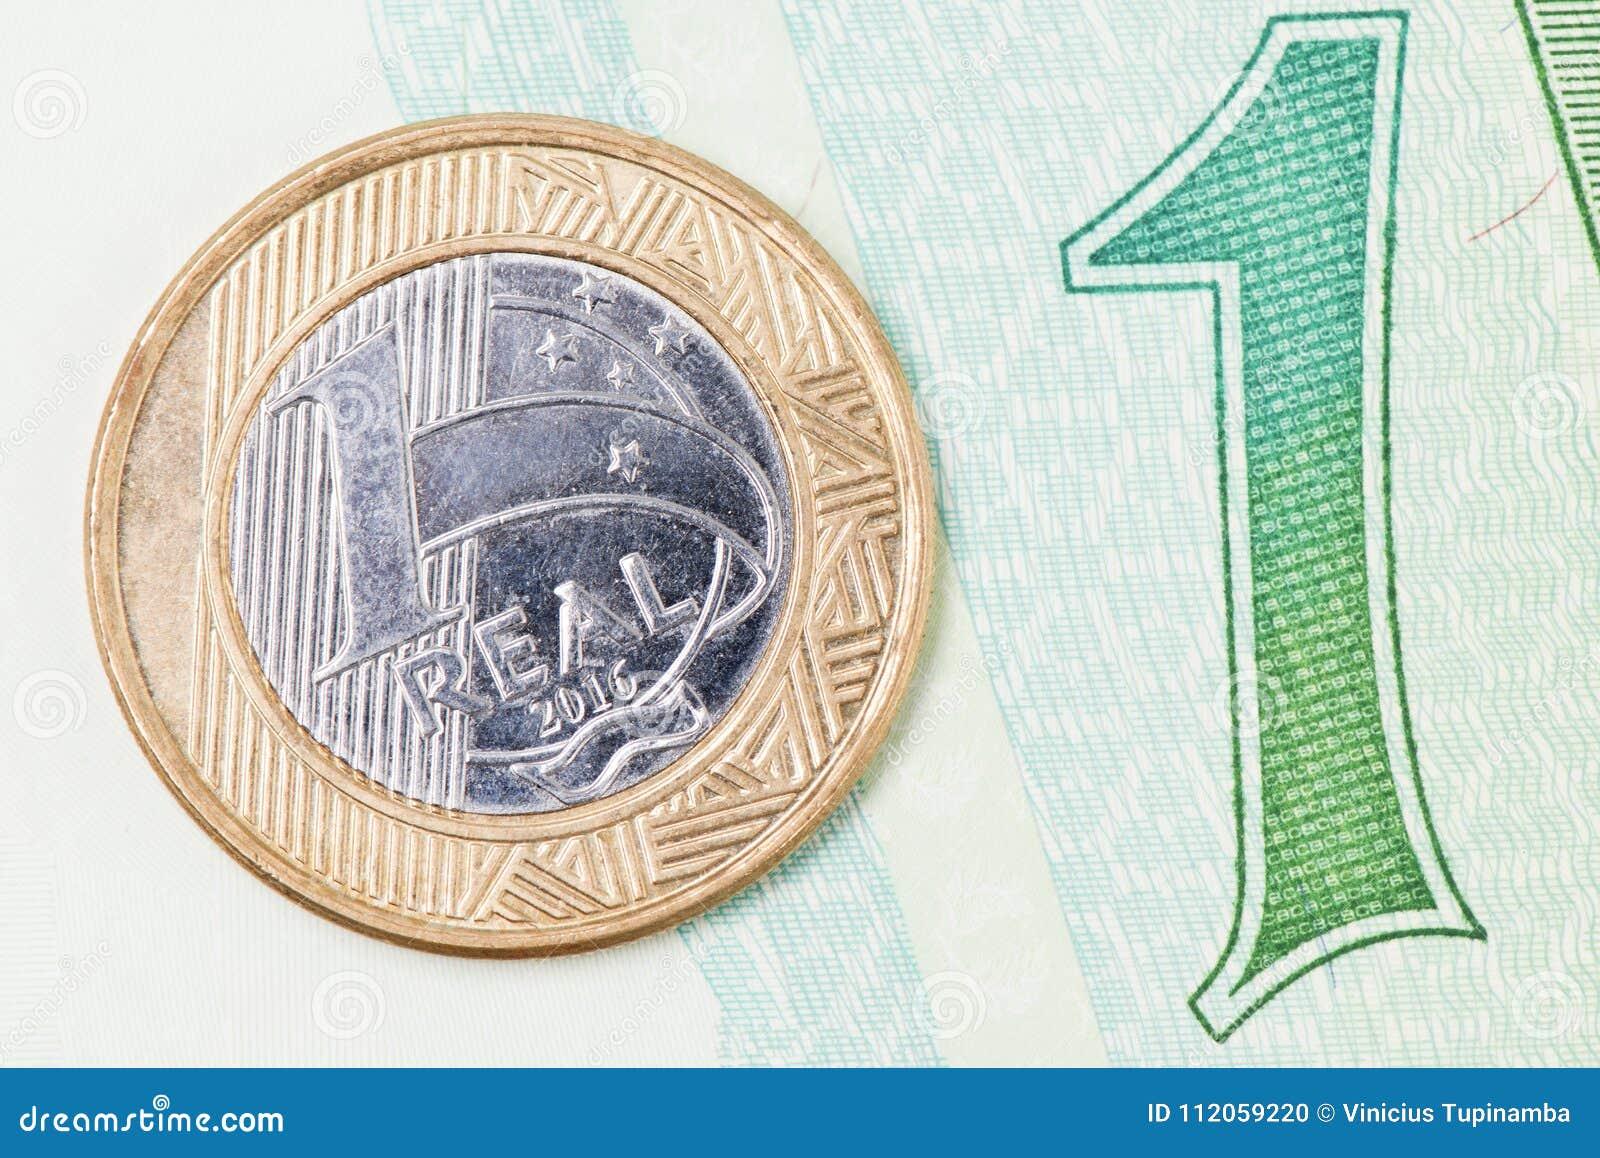 1 brazilian real stock photo image of brazil currencies 112059220 royalty free stock photo buycottarizona Images